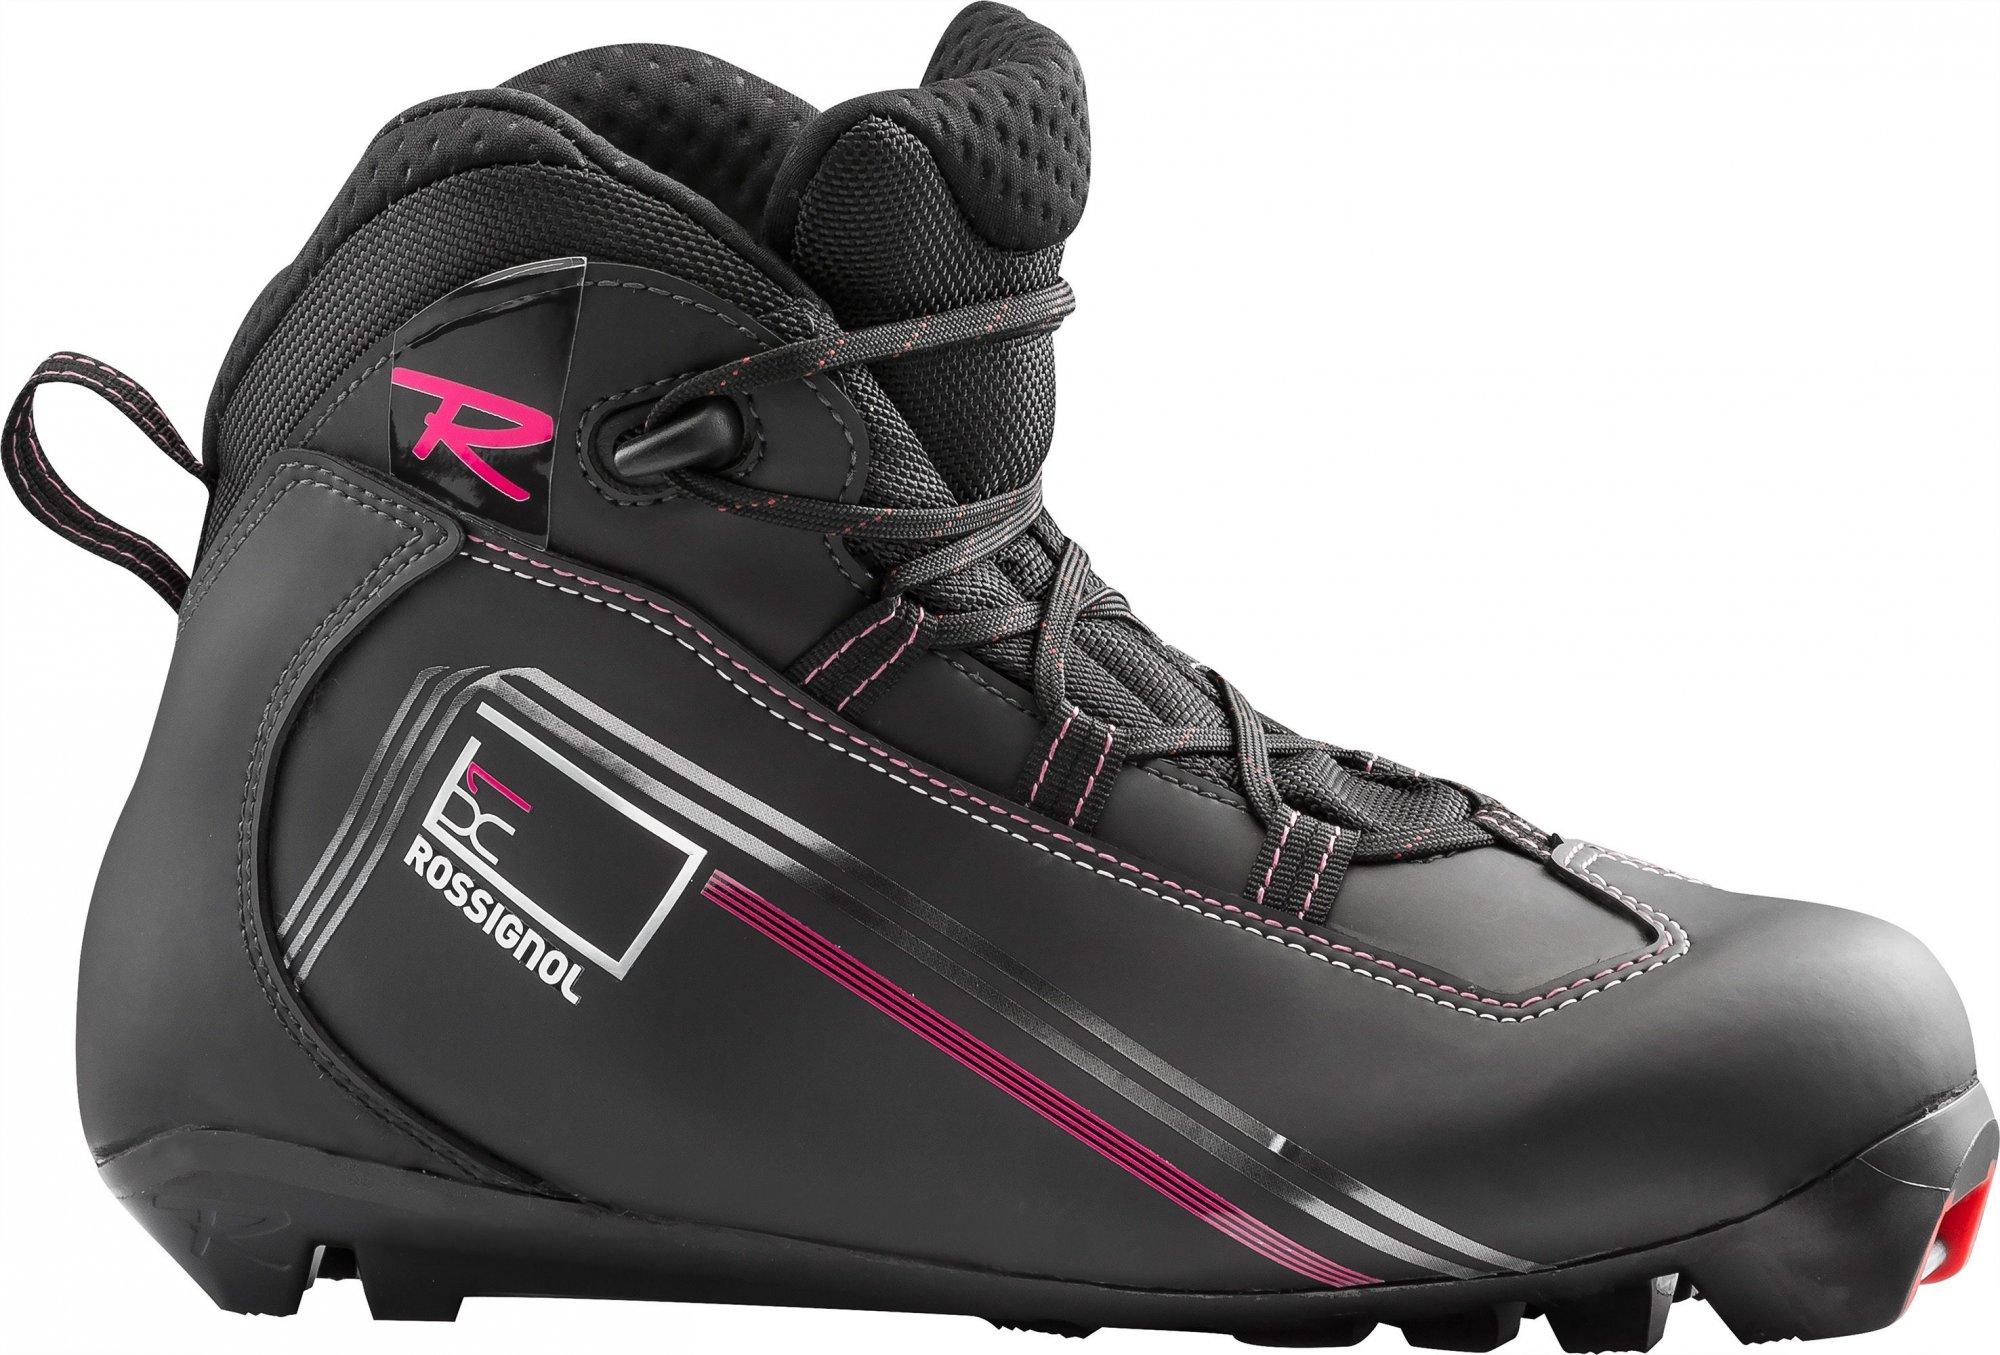 Rossignol X-1 Women's Nordic Ski Boots